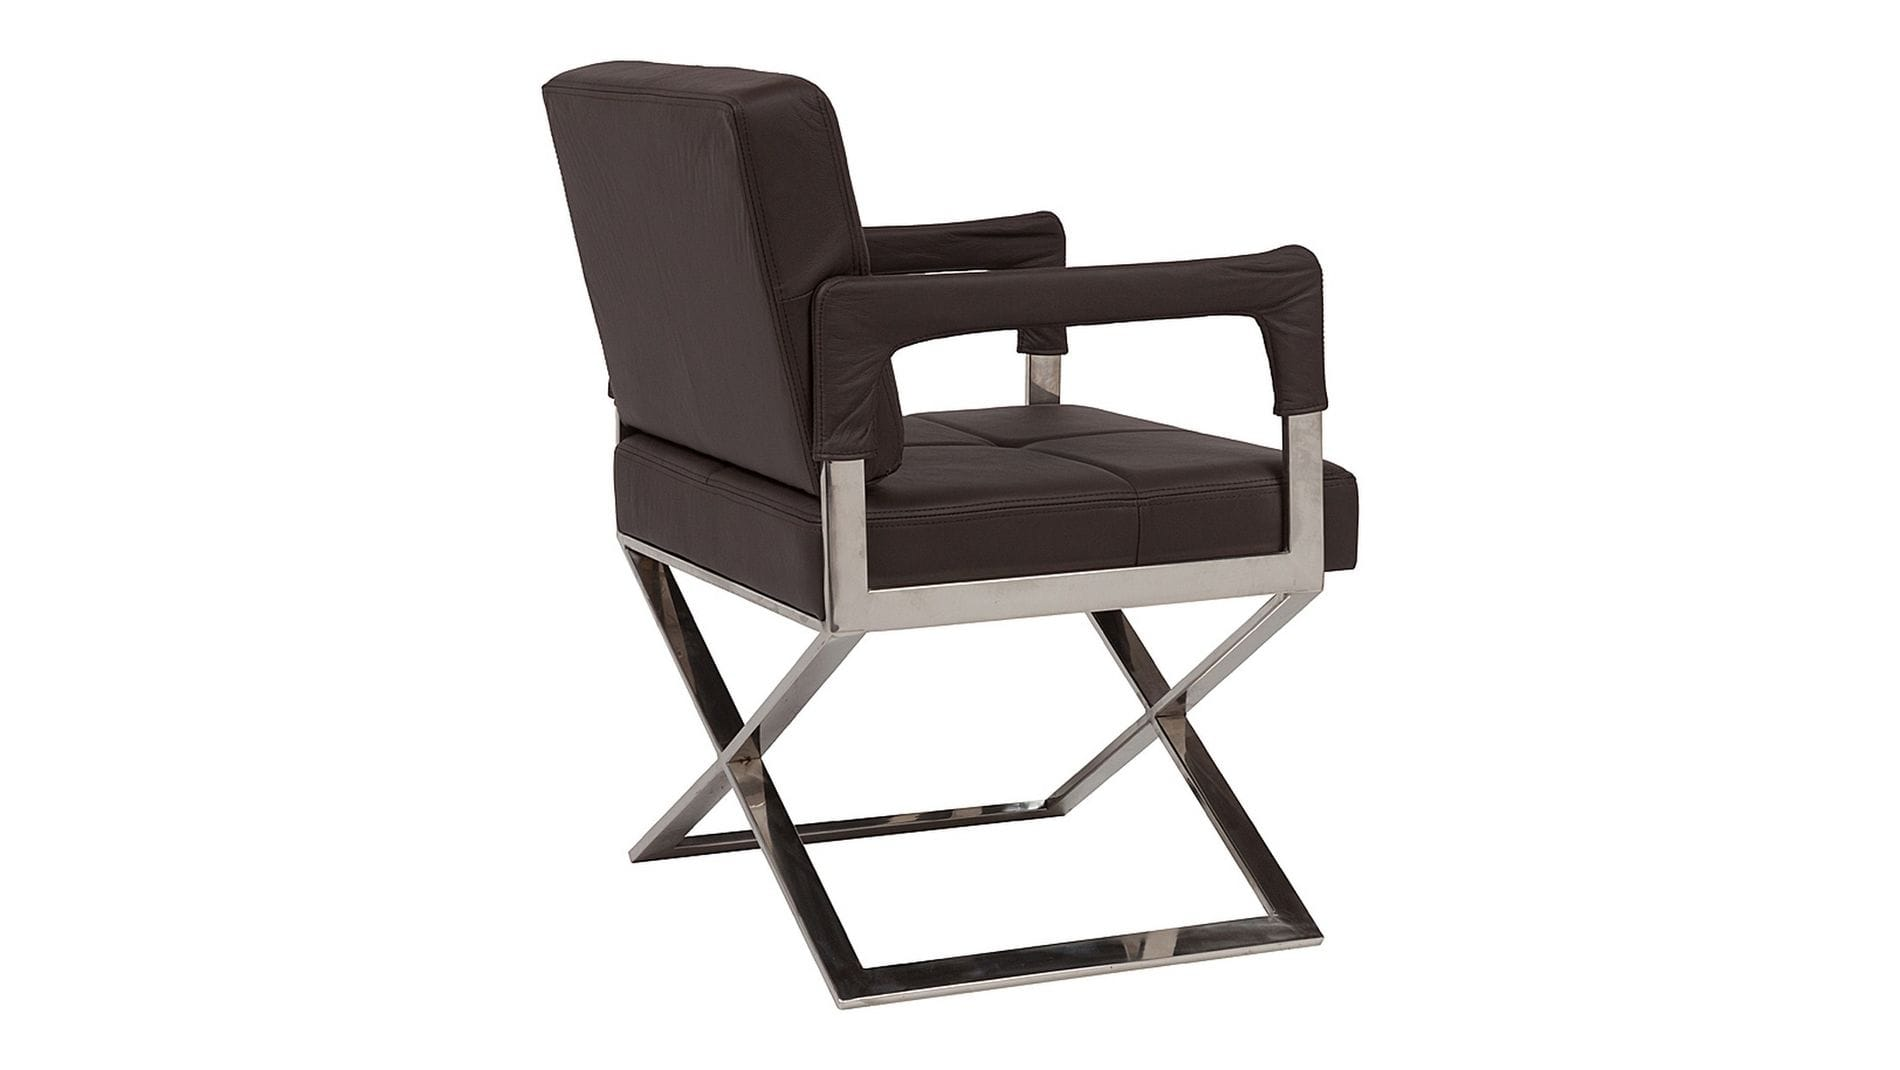 Кресло Aster X Chair Темно-коричневая Кожа Класса Премиум